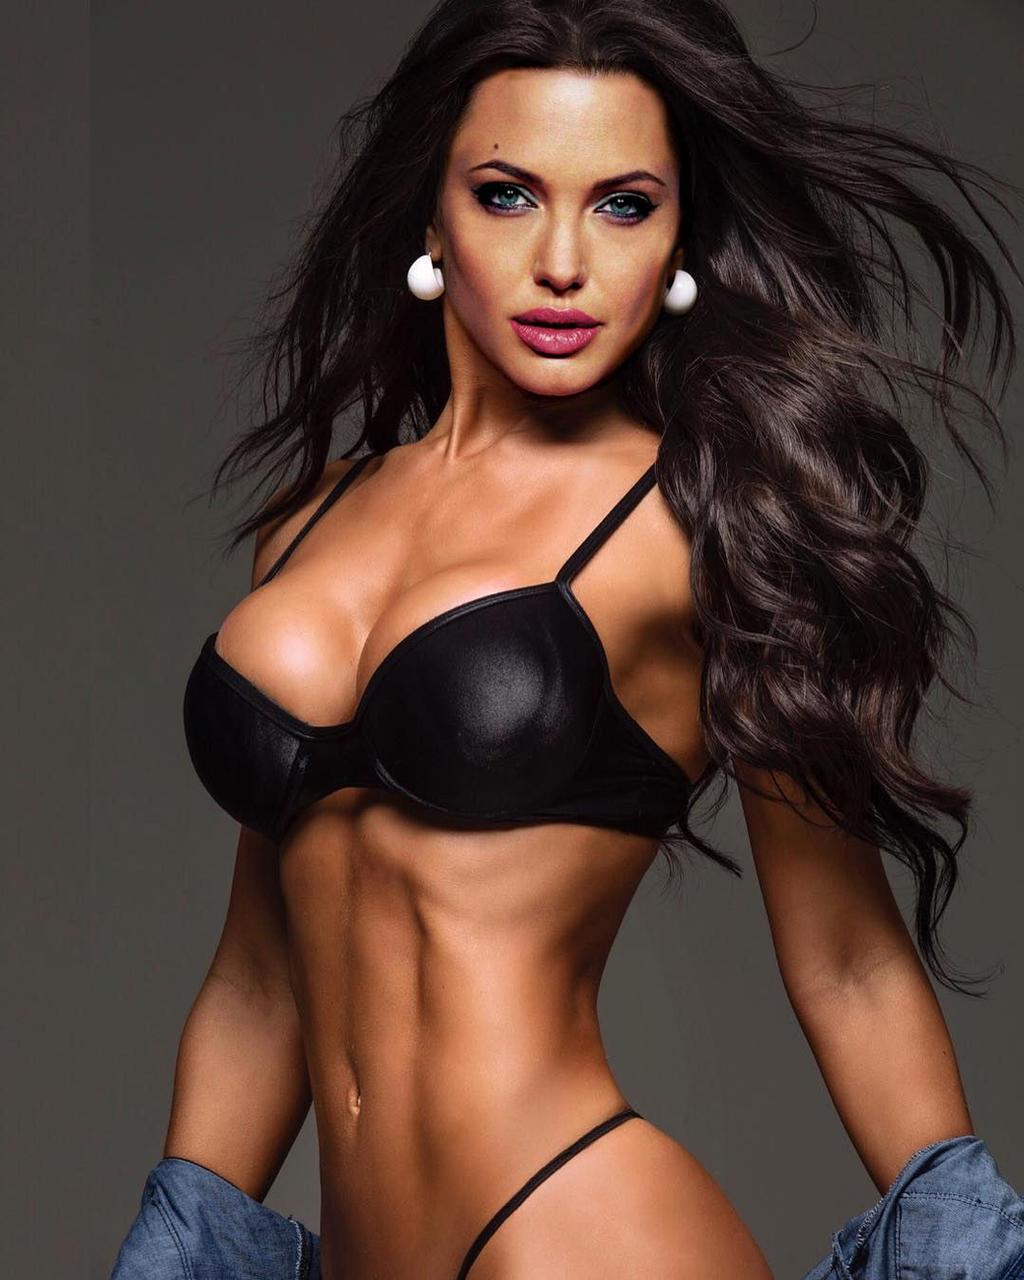 Angelina Jolie Sex angelina jolie - sexy concept 22jmurdoch on deviantart